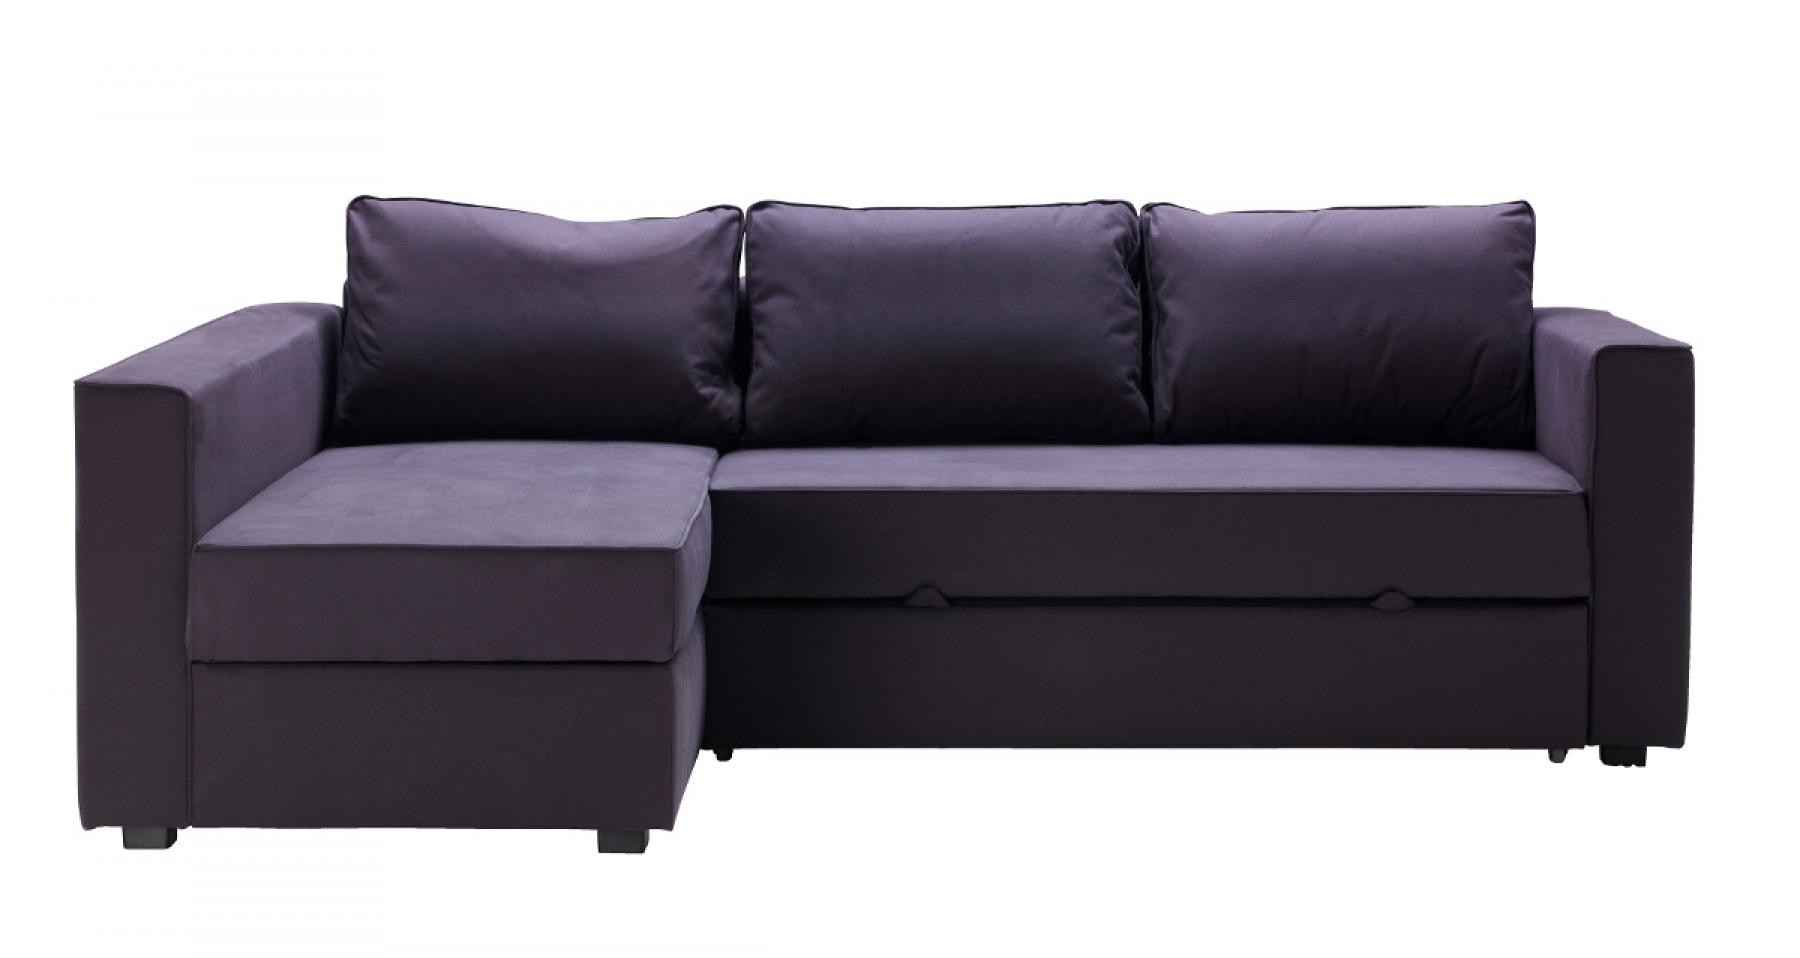 Canape D Angle Ikea Convertible Luxe Stock Vimle Ikea sofa Review New Canaper Dangle Canape Dangle Convertible